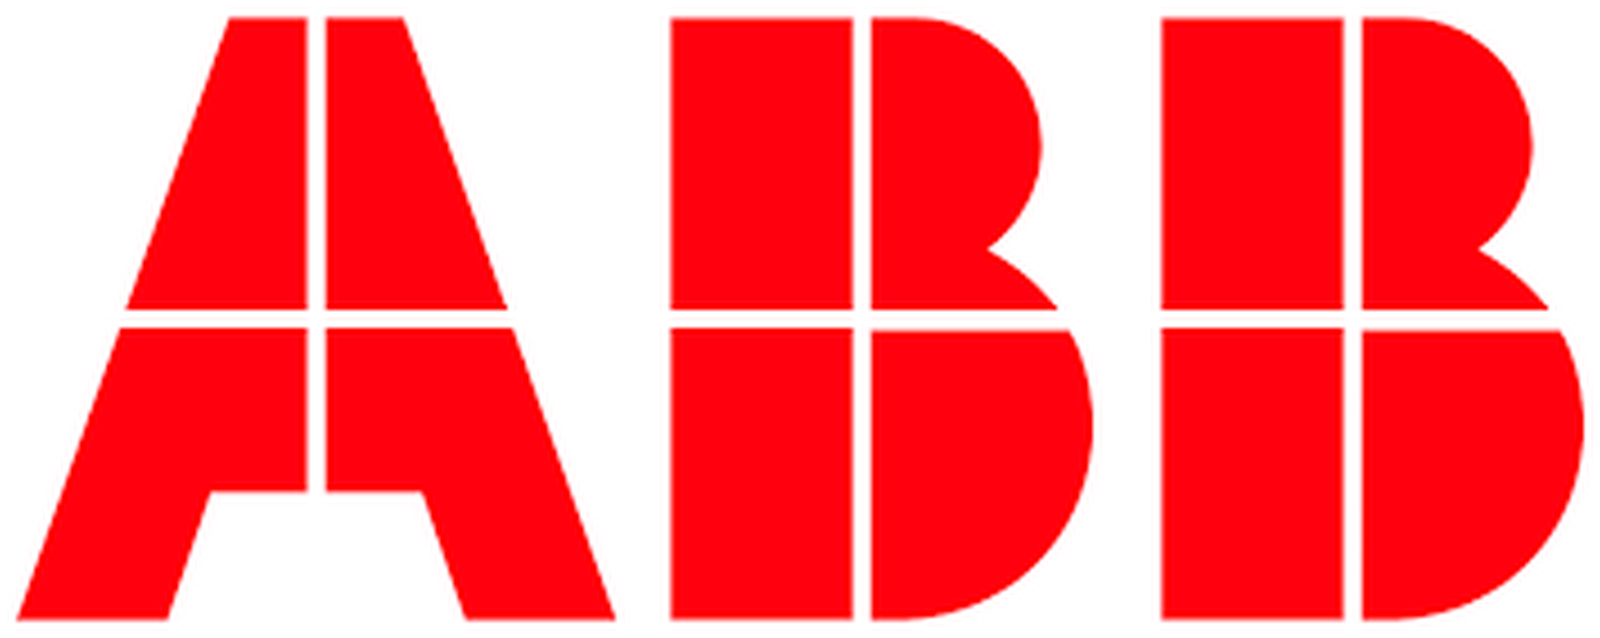 Youtube for Architects: 'Smart Cities / Smart Buildings' seminar- Zaha Hadid Architects Sheet2